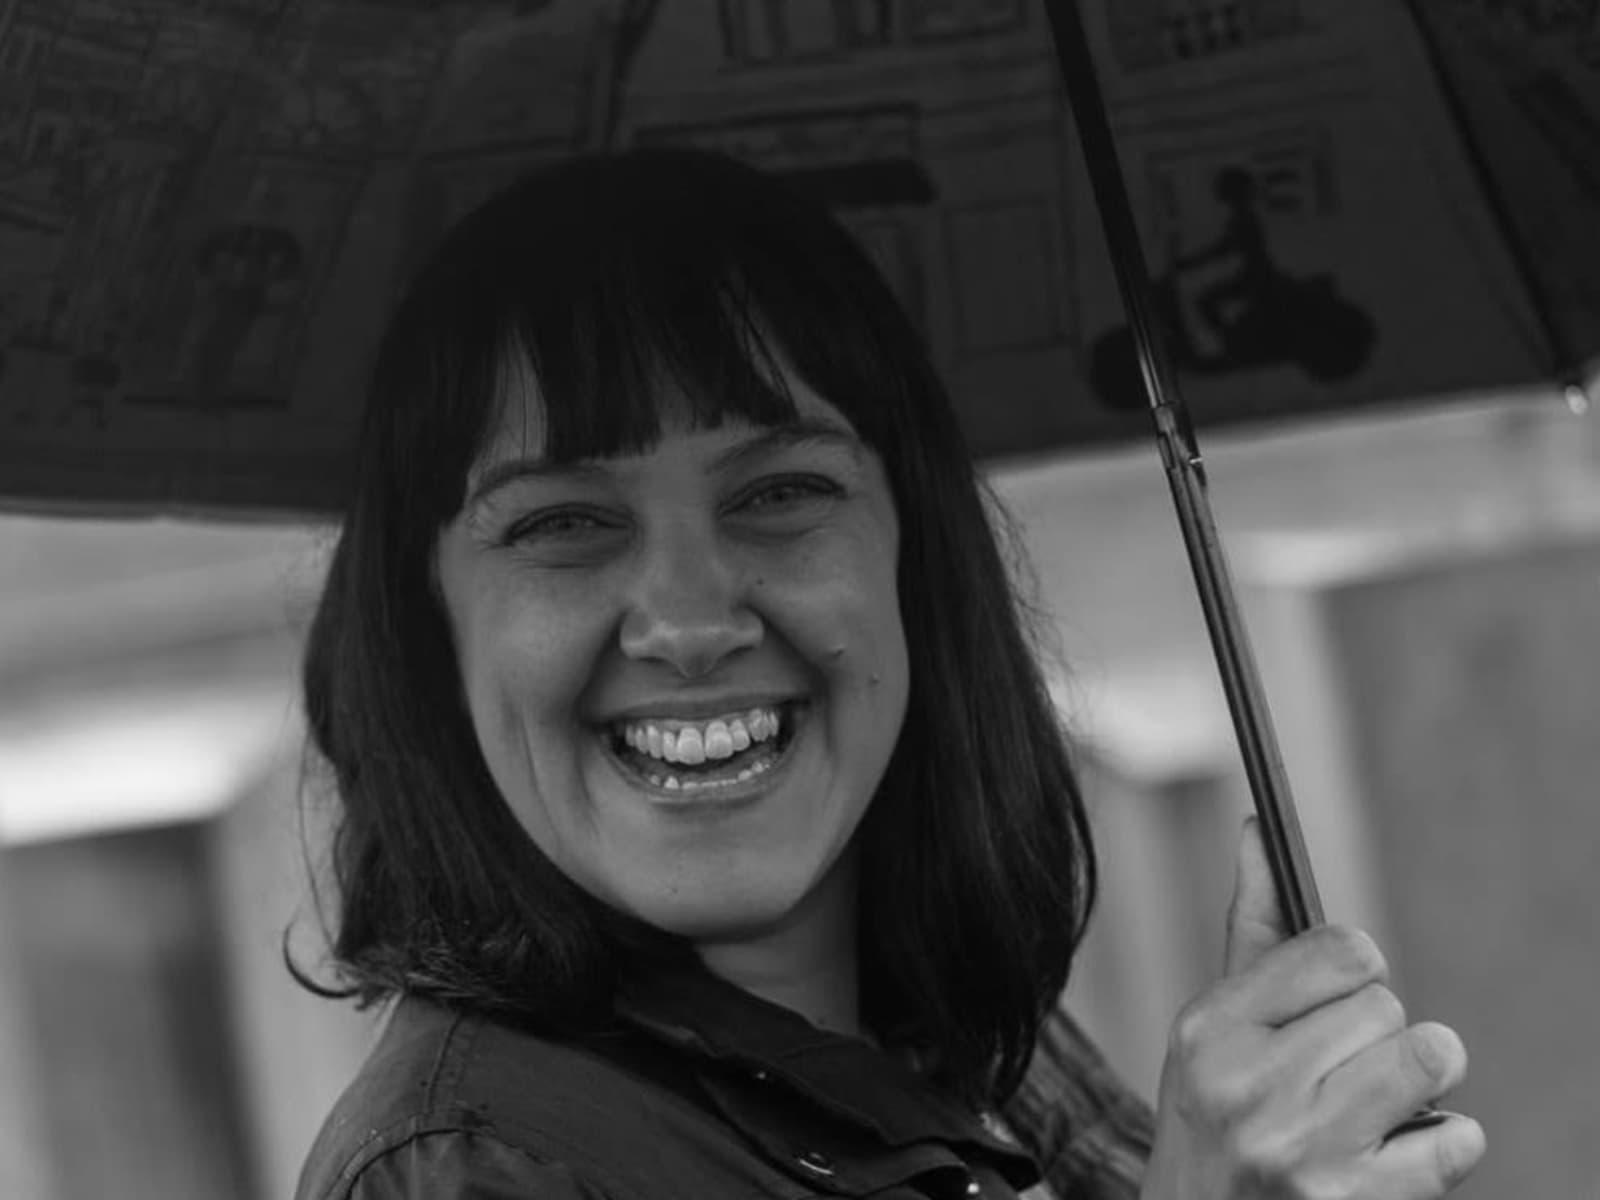 Teresa from Clapham Junction, United Kingdom